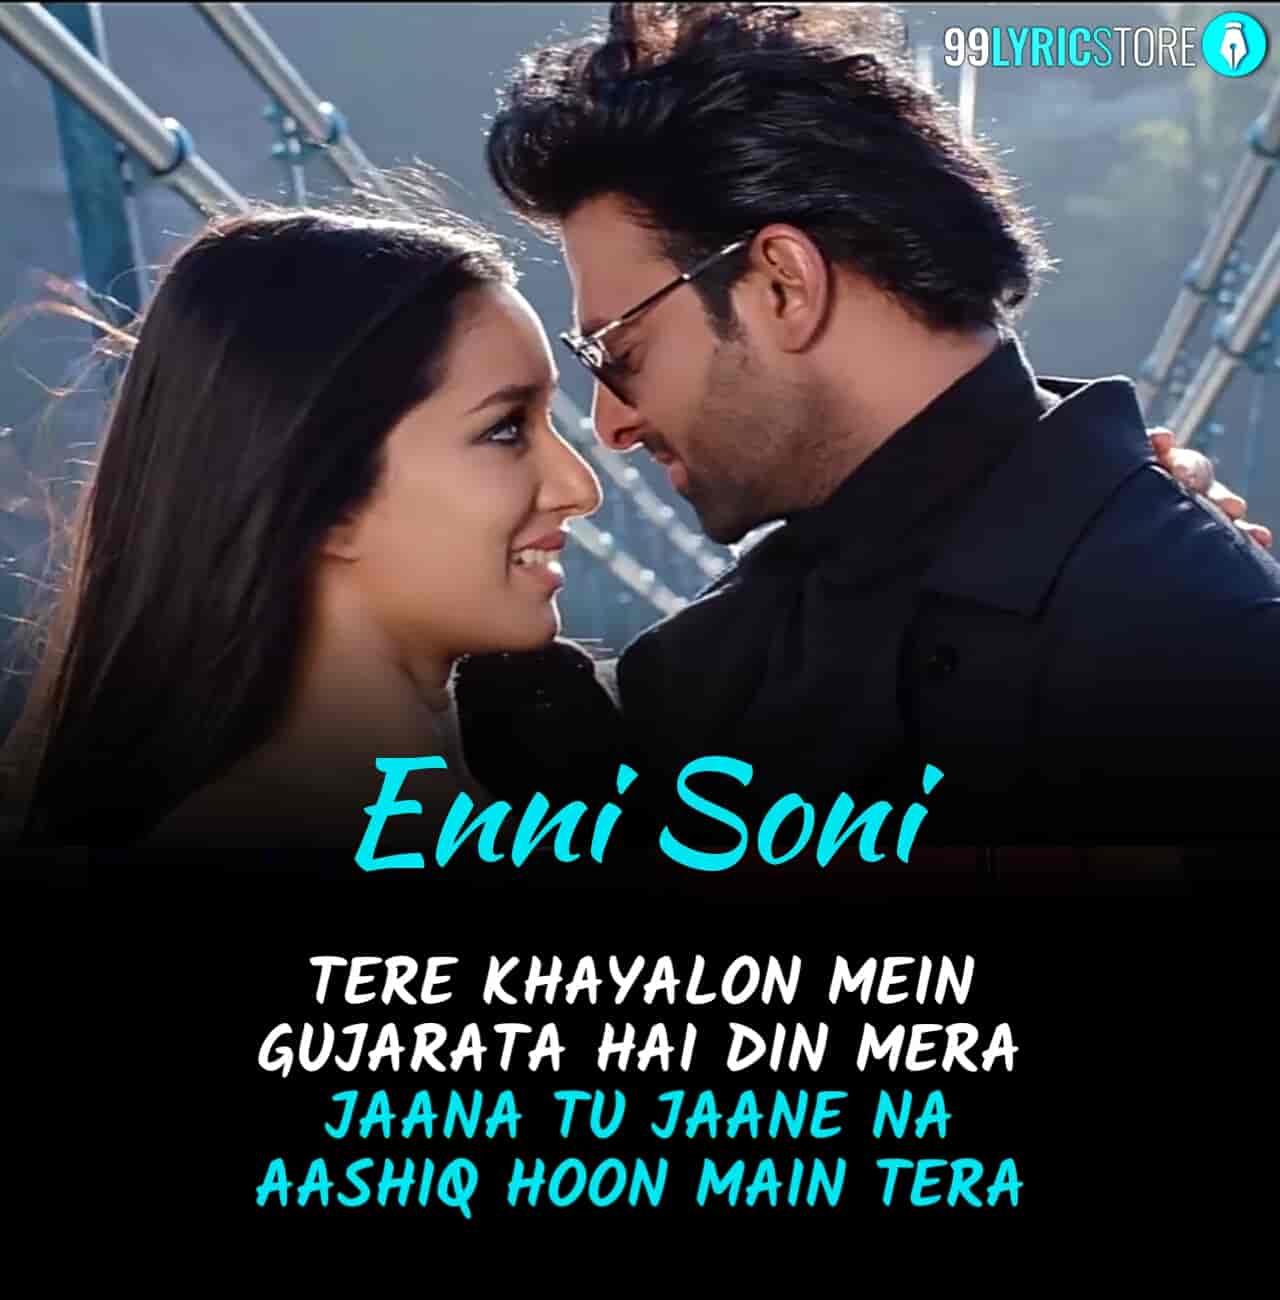 Enni Soni Song sung by Guru Randhawa from movie Saaho